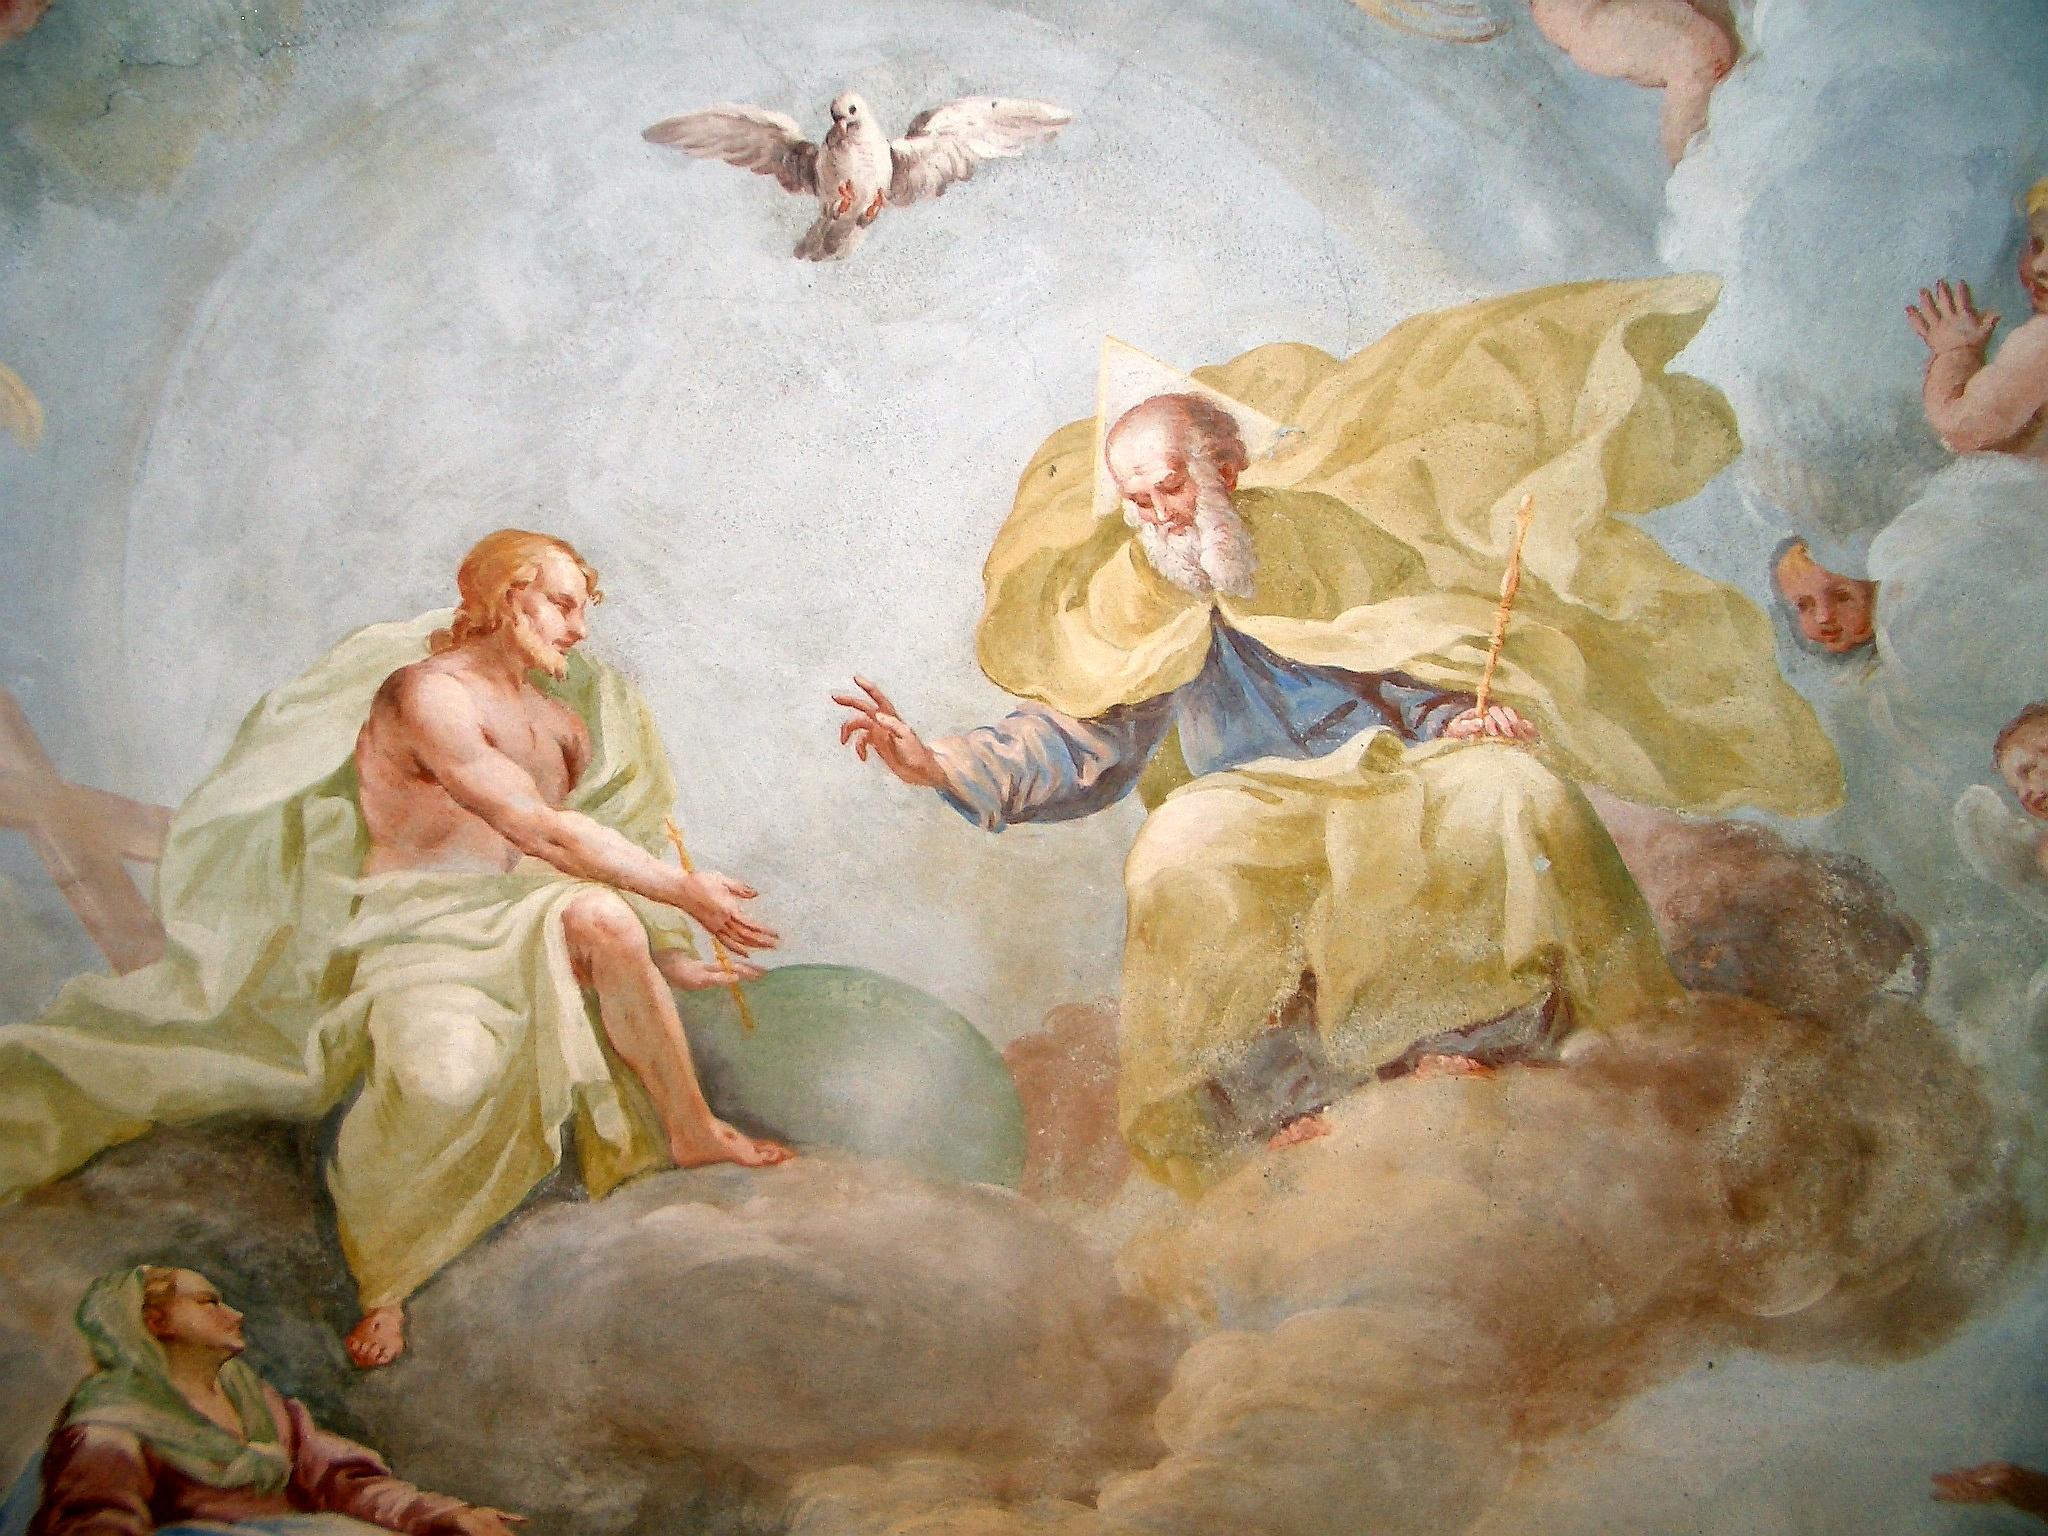 Holy Trinity, fresco by Luca Rossetti da Orta, 1738-9 (St. Gaudenzio Church at Ivrea, Torino). dans images sacrée Luca_Rossetti_Trinit%C3%A0_Chiesa_San_Gaudenzio_Ivrea